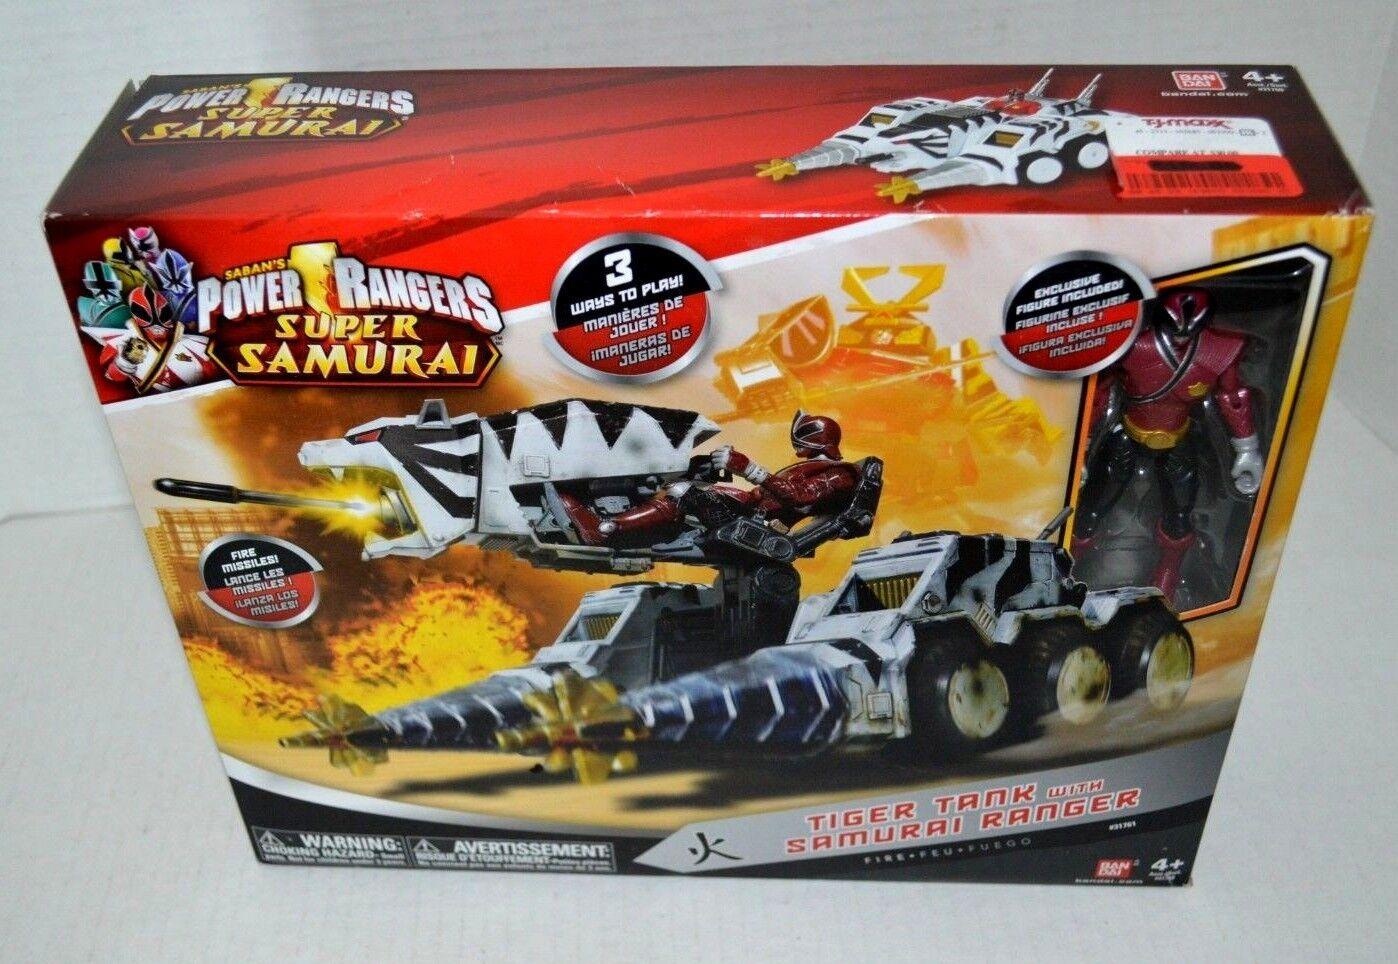 Power Rangers Super Samurai TIGER TANK Megazord Vehicle Action Figure with Box